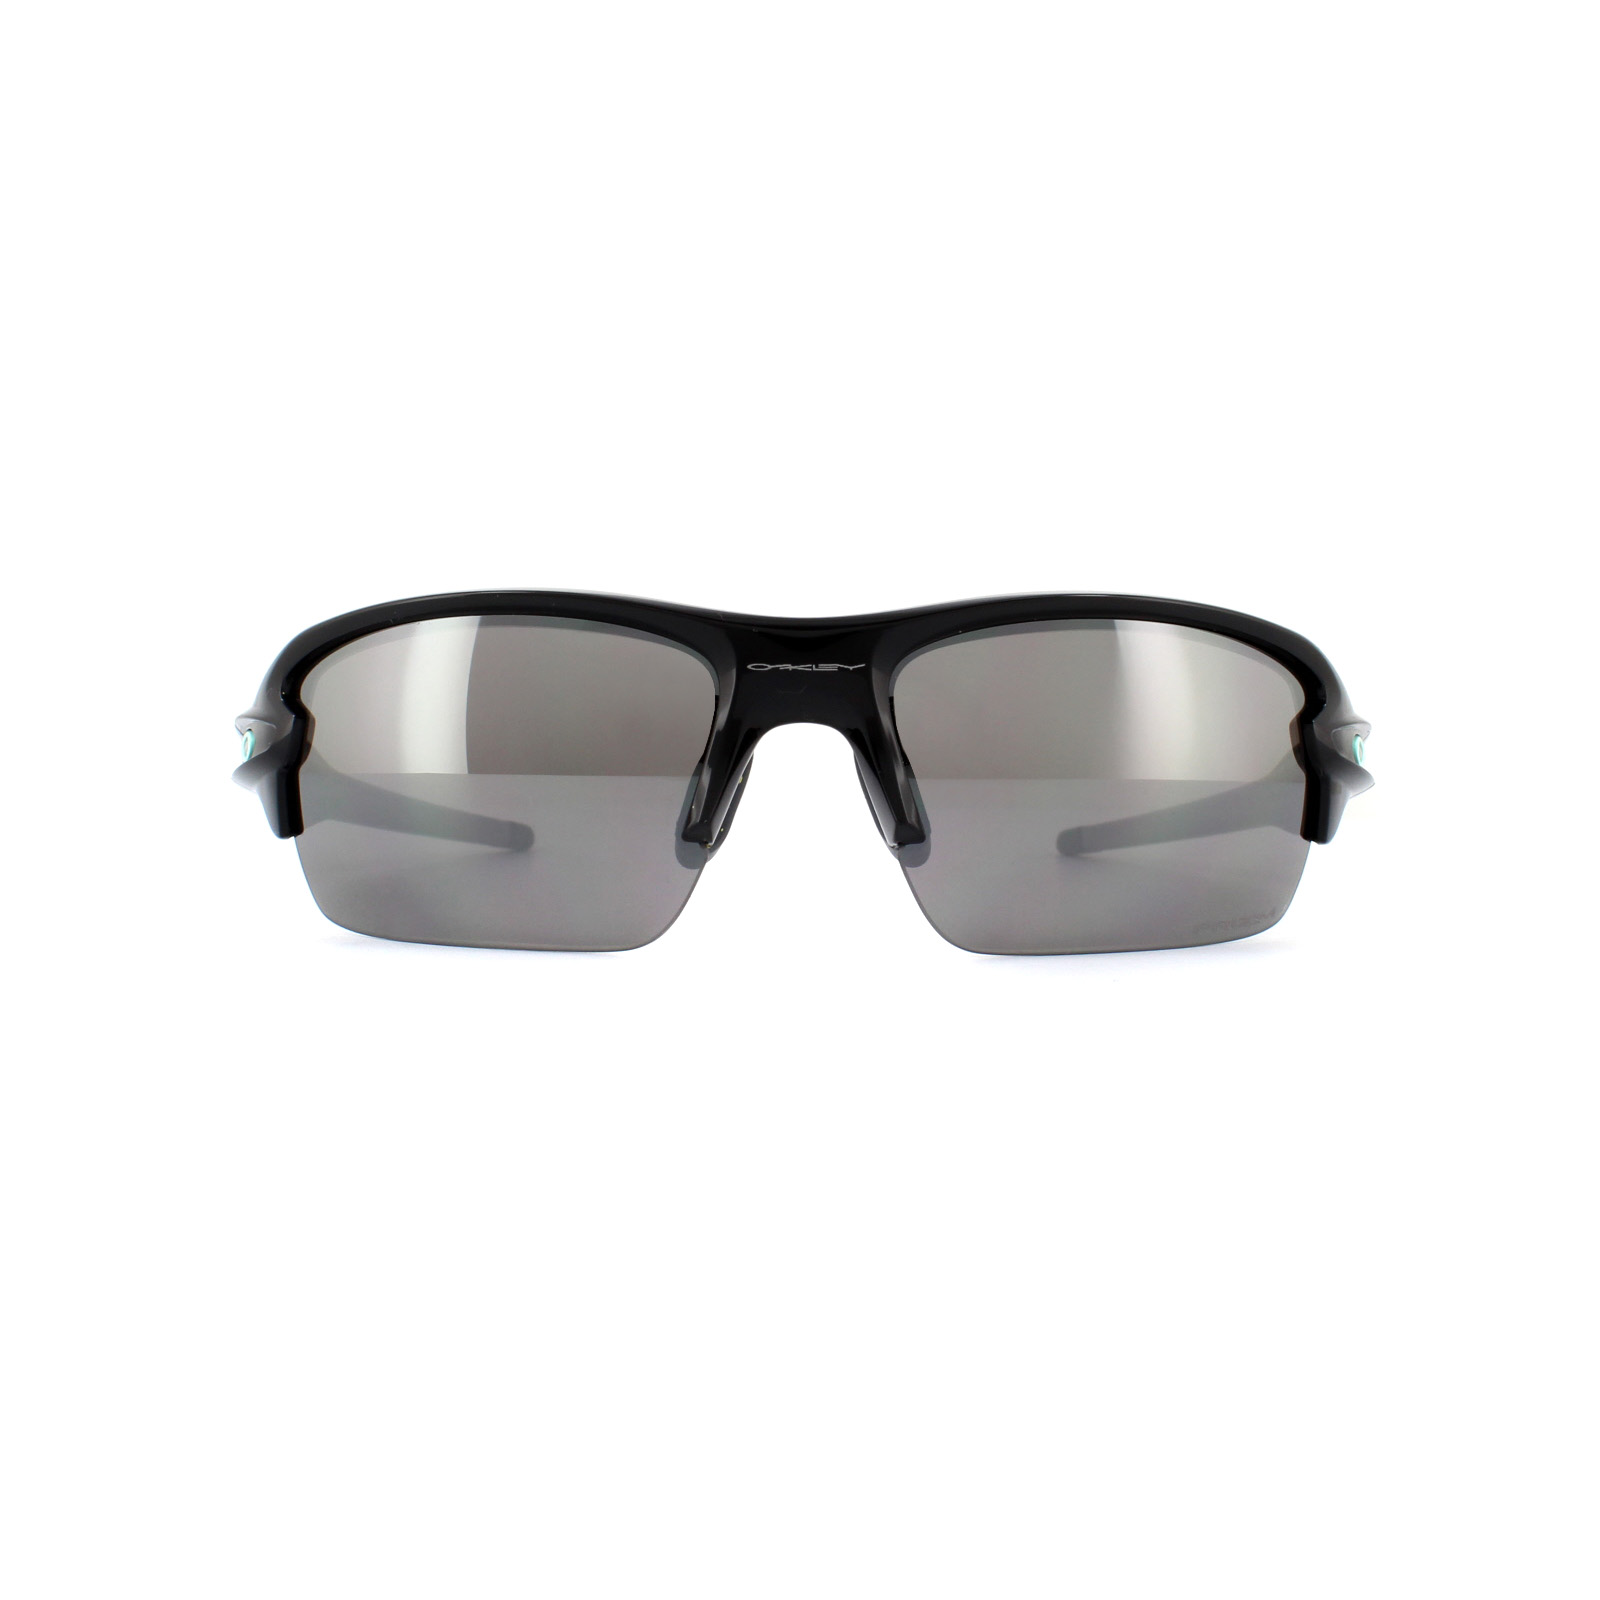 877cef2723 Sentinel Oakley Sunglasses Flak XS Youth OJ9005-06 Pol White Prizm Deep  Water Polarized